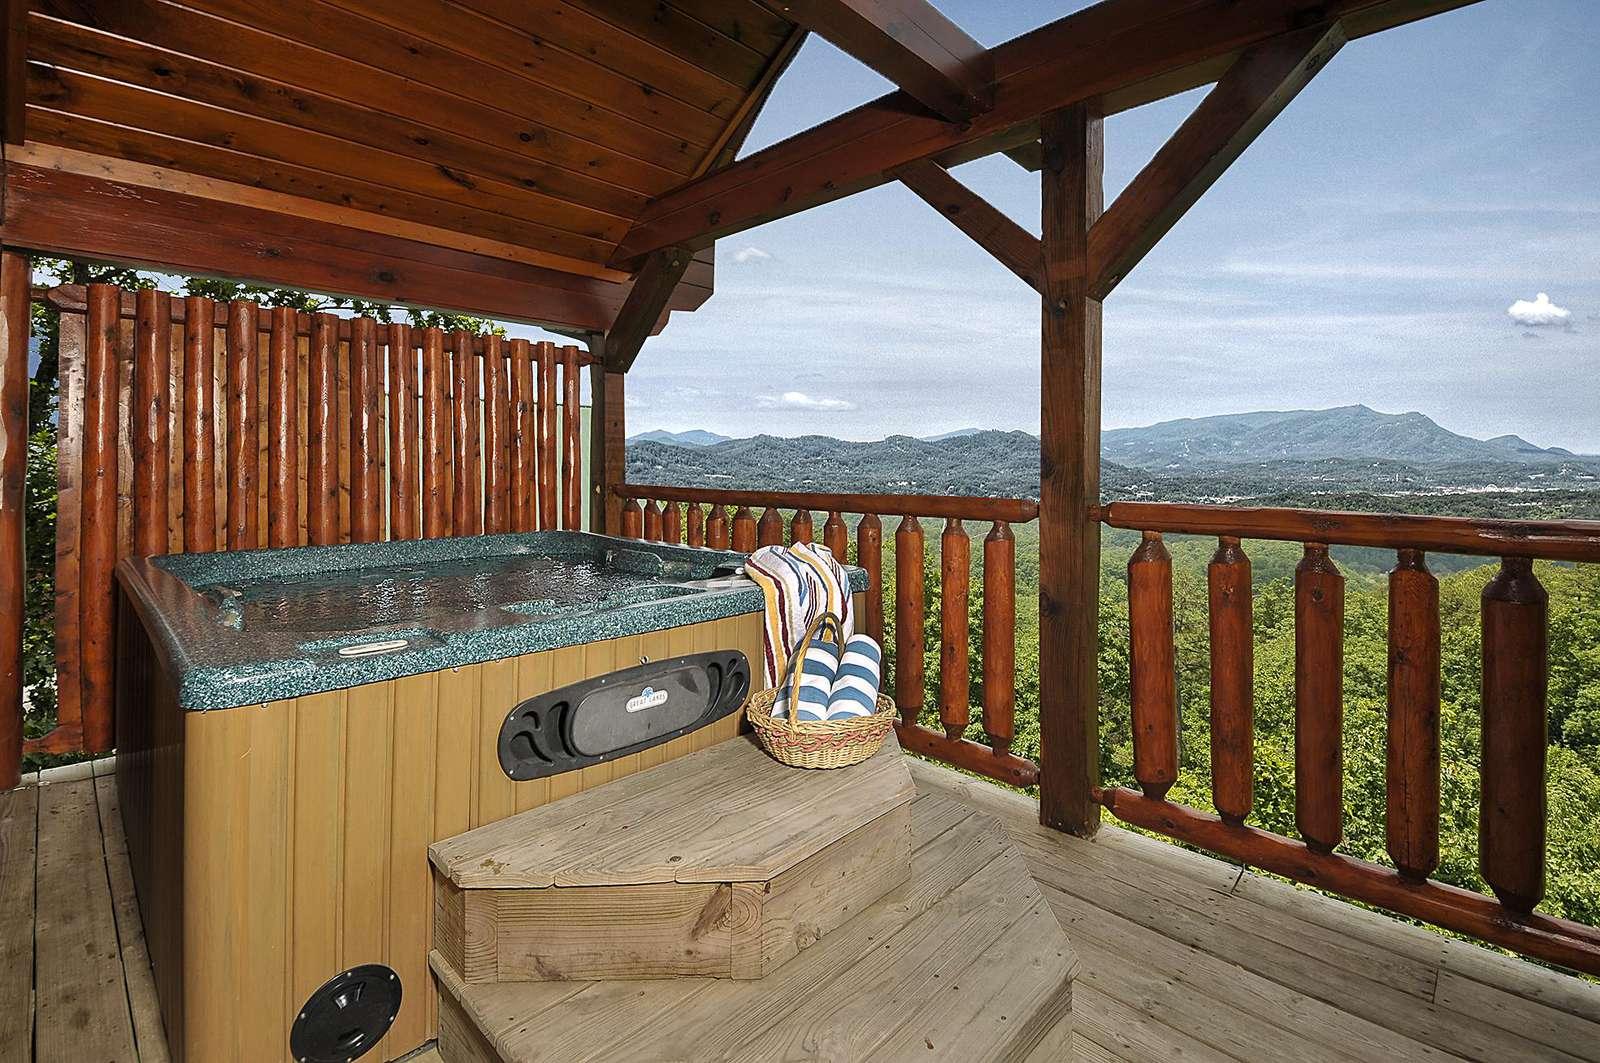 Hot Tub overlooking Amazing Views